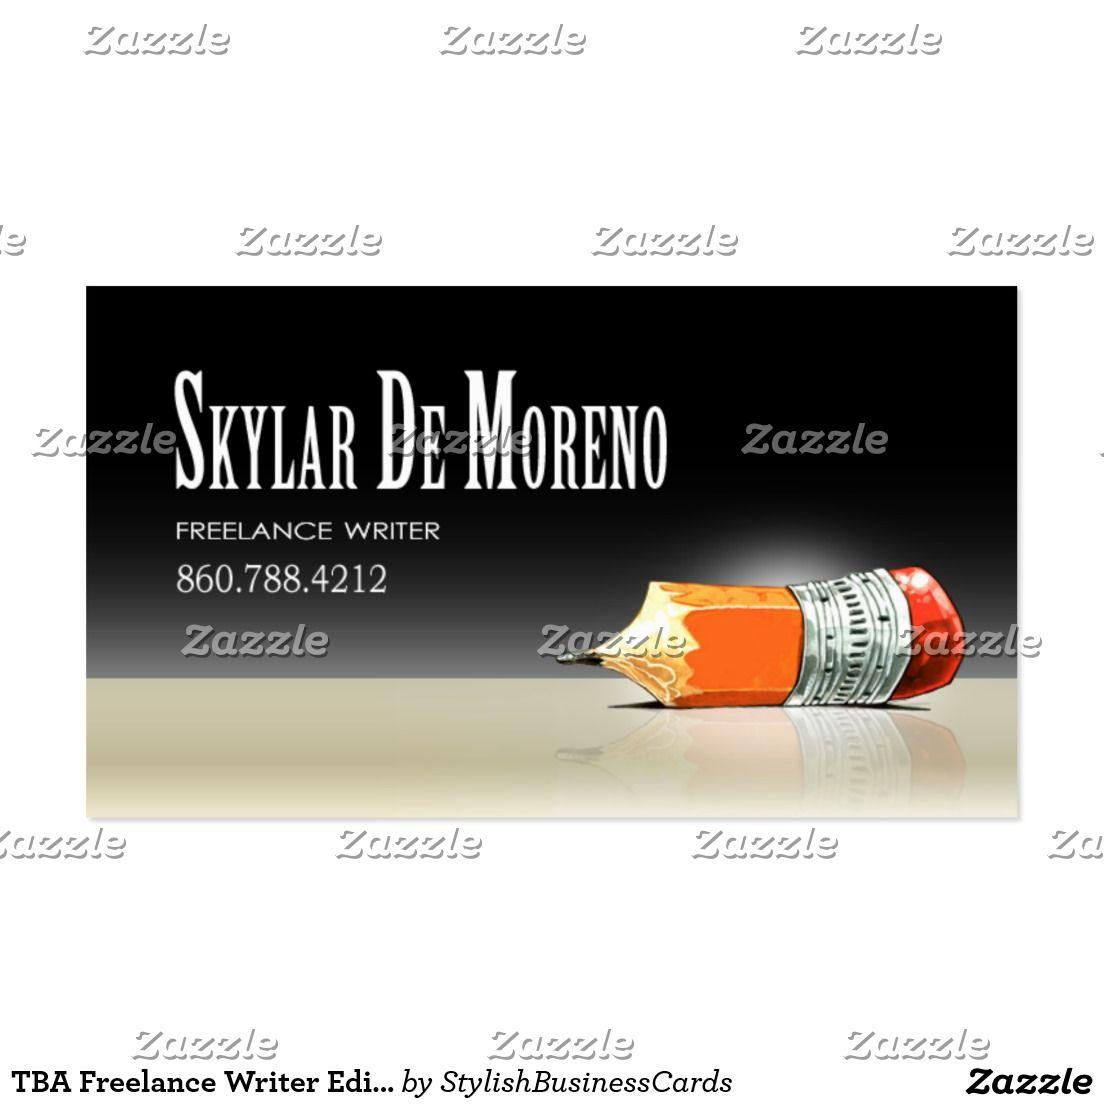 TBA Freelance Writer Editor 5 Stylish Business Card | Business Cards ...